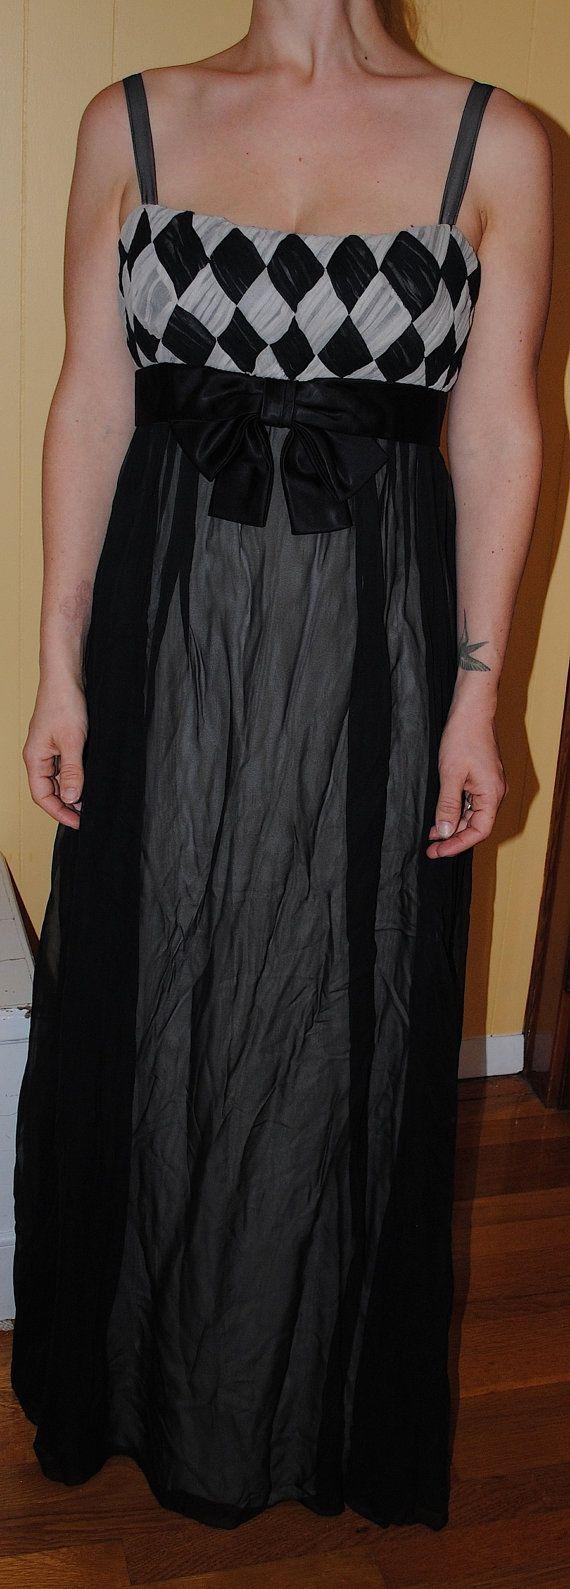 Vintage Saks Fifth Avenue Black Chiffon Formal   Saks Fifth Avenue ...